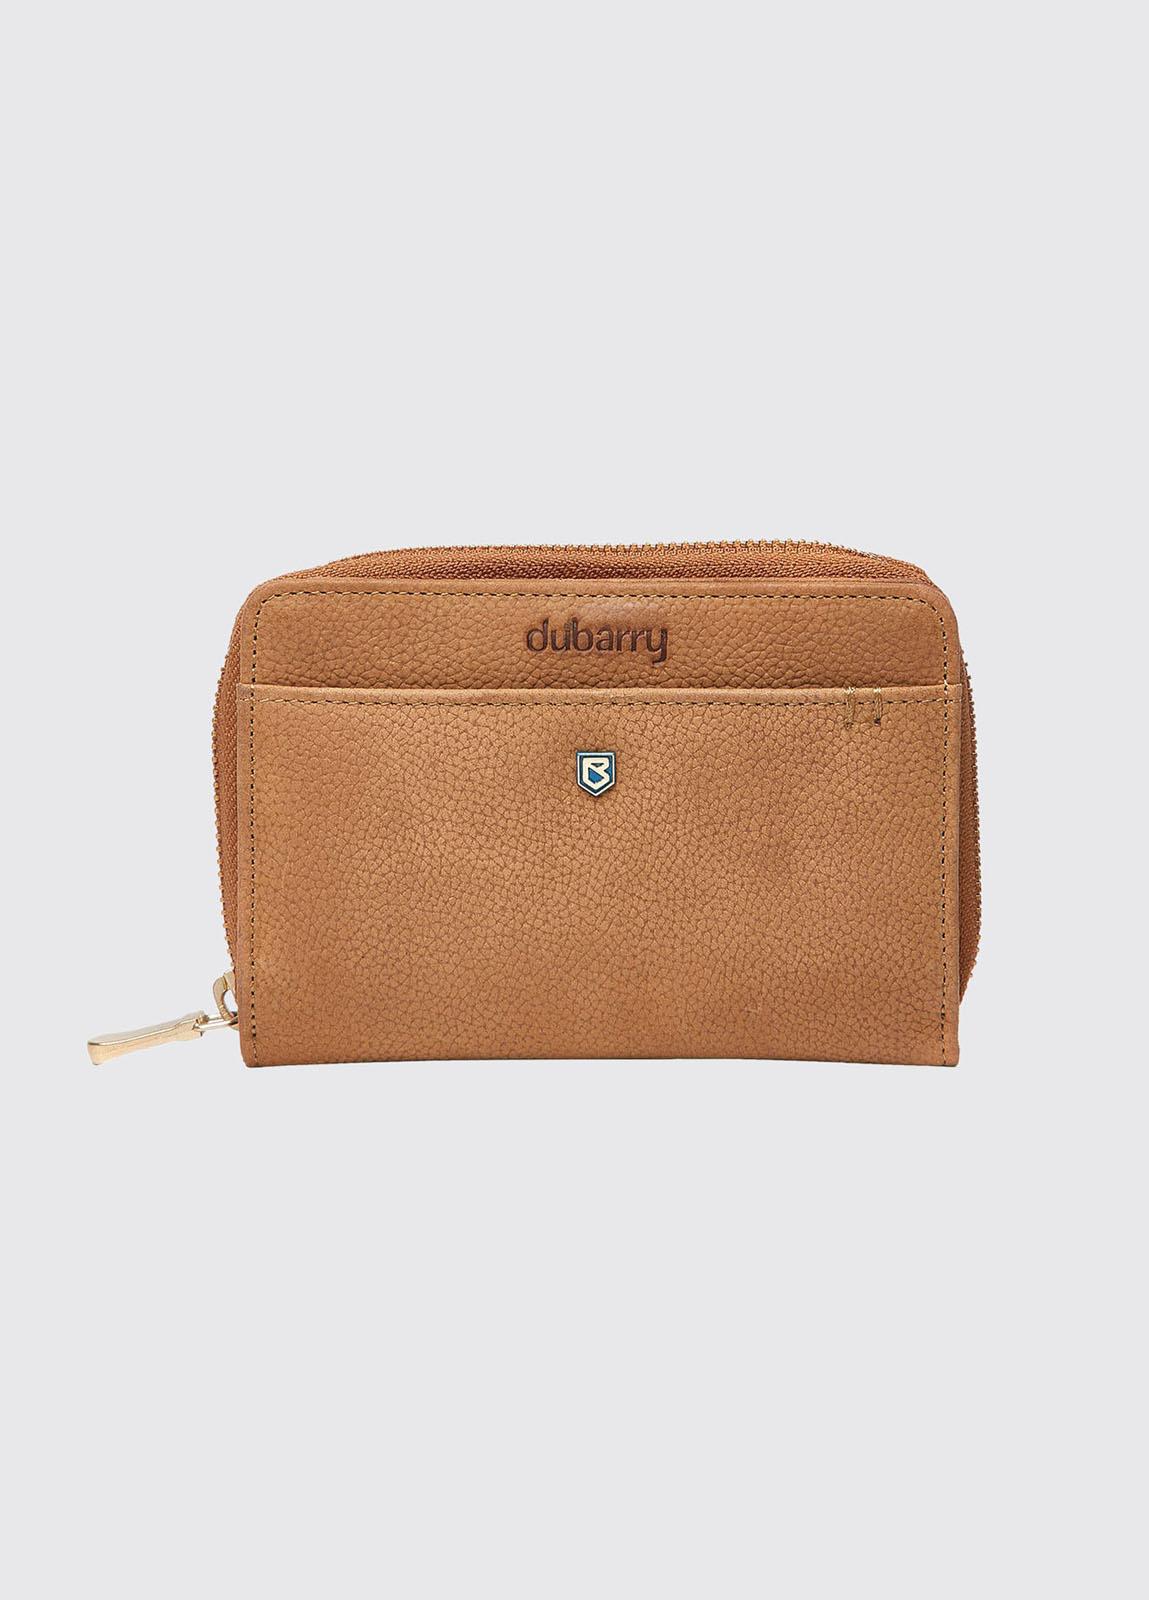 Portrush Leather Wallet - Tan